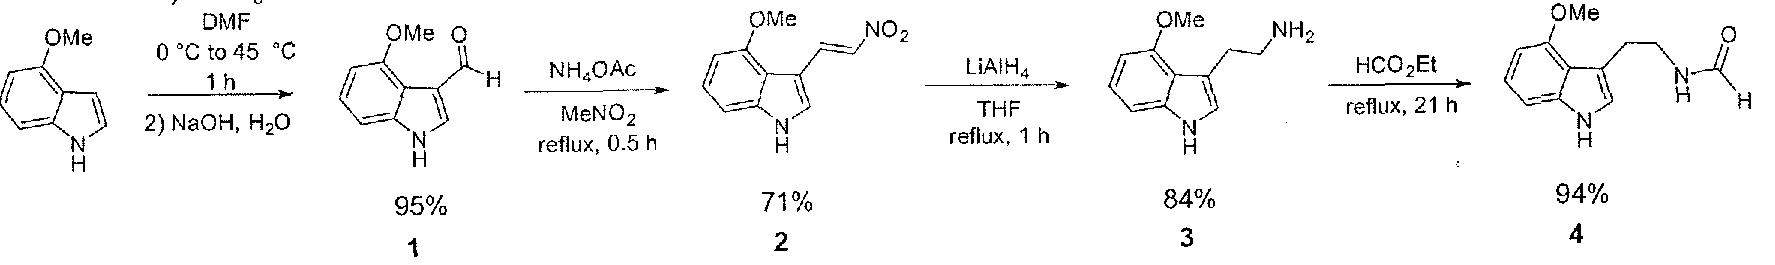 WO2017165738A1 - Mitragynine alkaloids as opioid receptor modulators